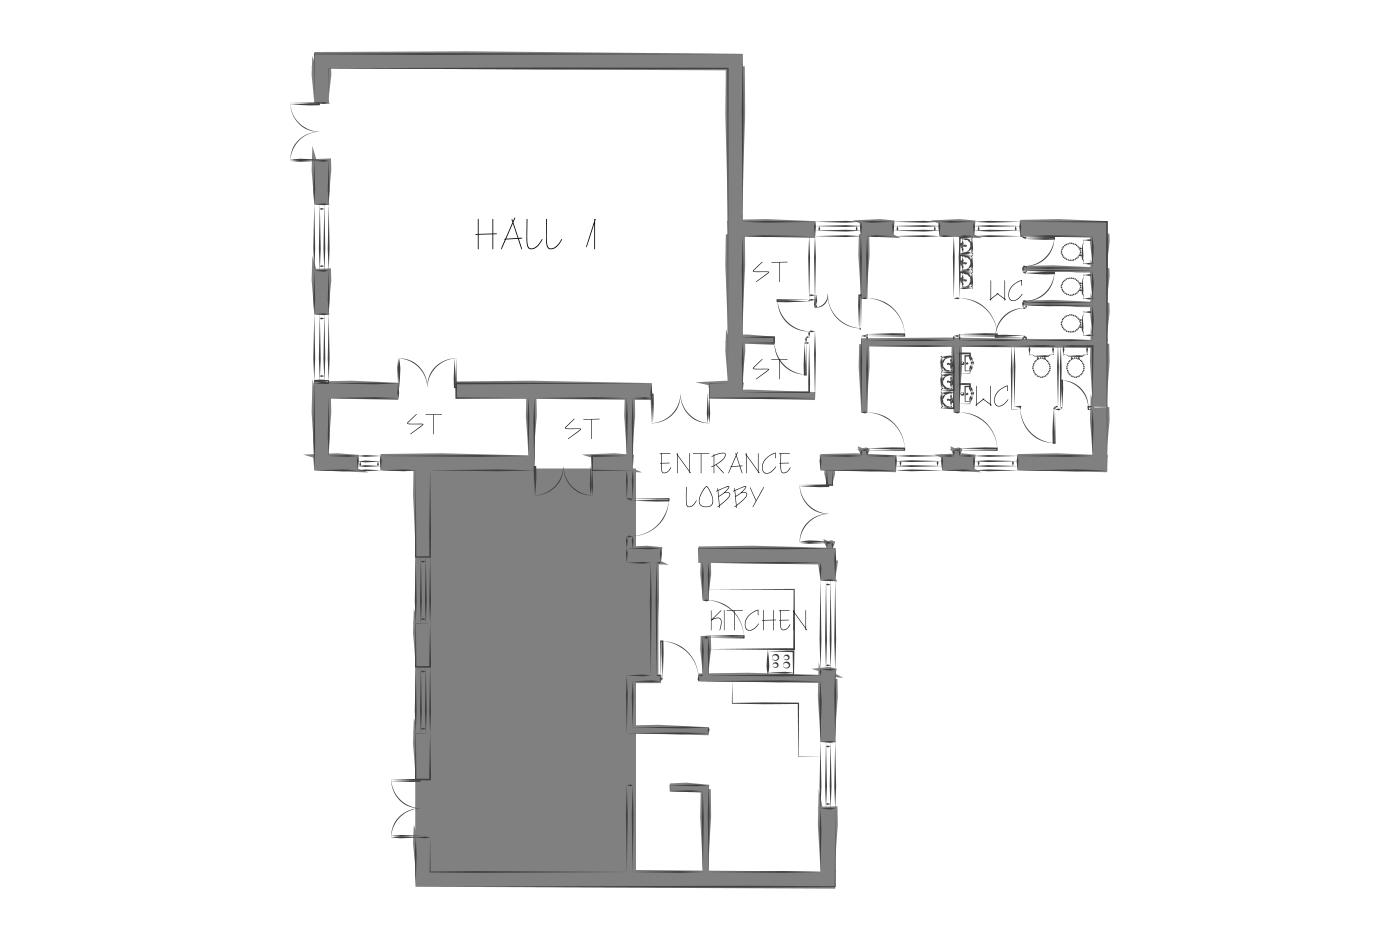 Bellinge community centre floor plan